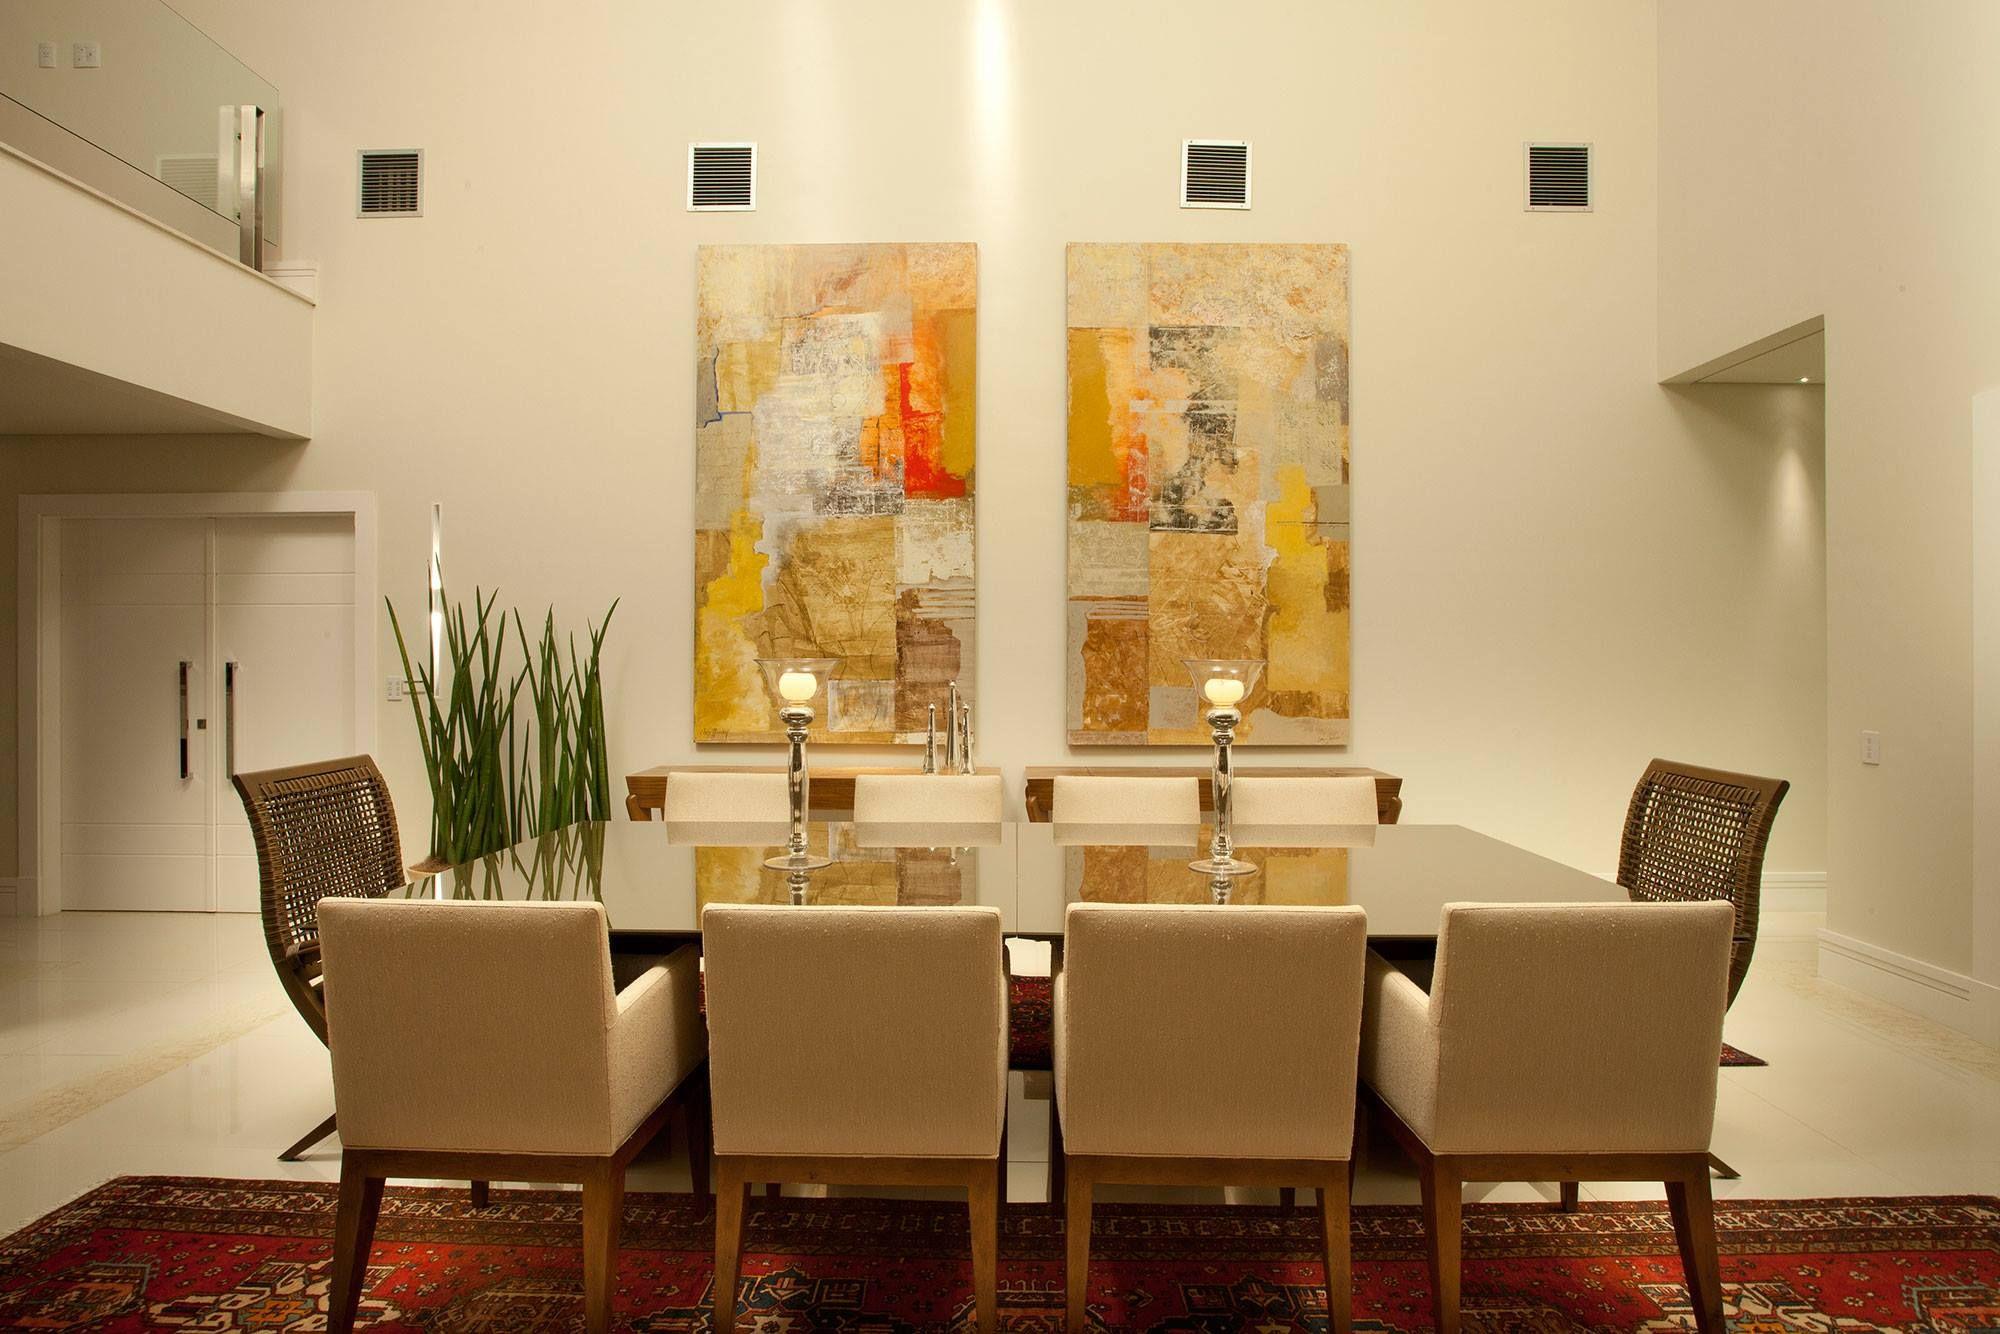 Mirored table